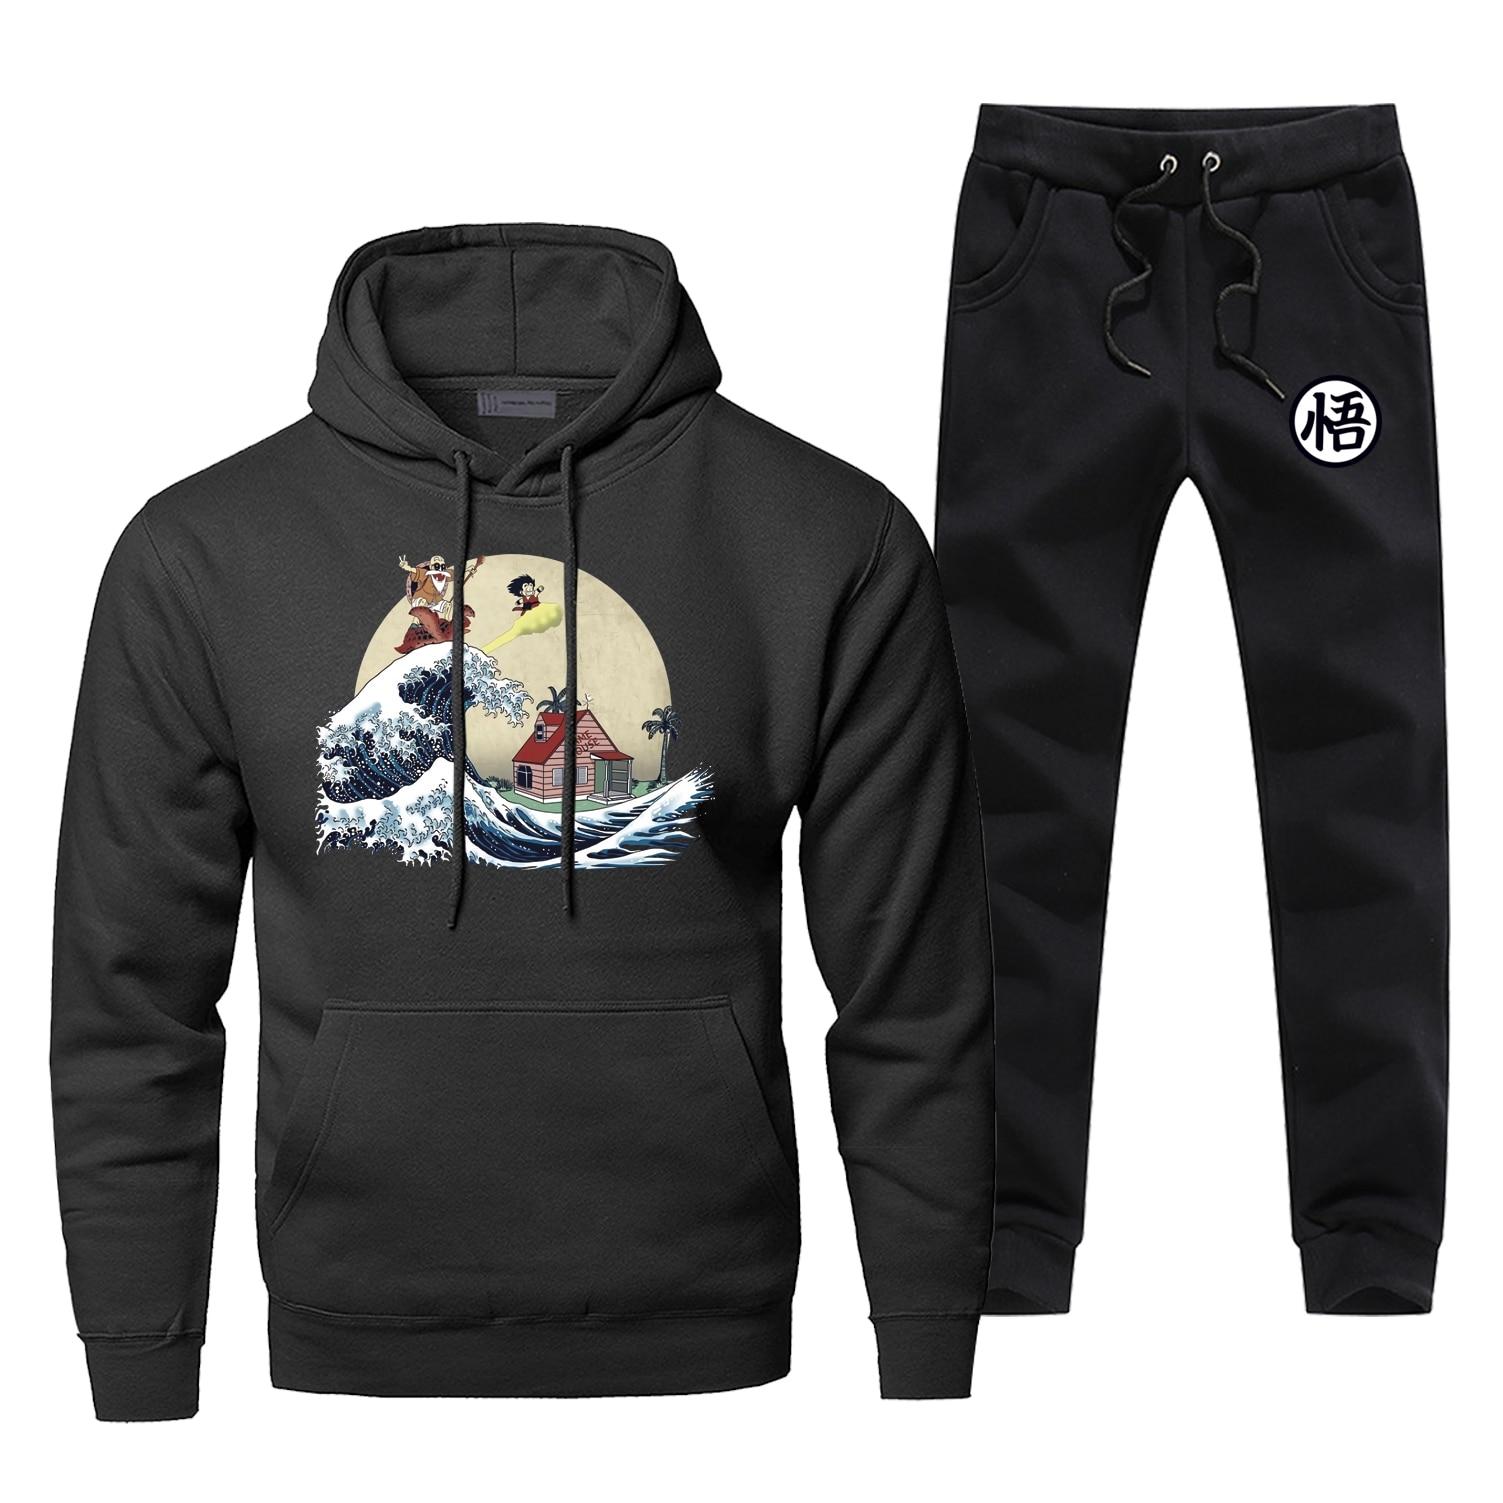 Classic Japan Anime Hoodies Dragon Ball Ocean Waves Master Roshi Men's Fleece Hoodie+pants  Sets Casual Winter Warm Sportswear